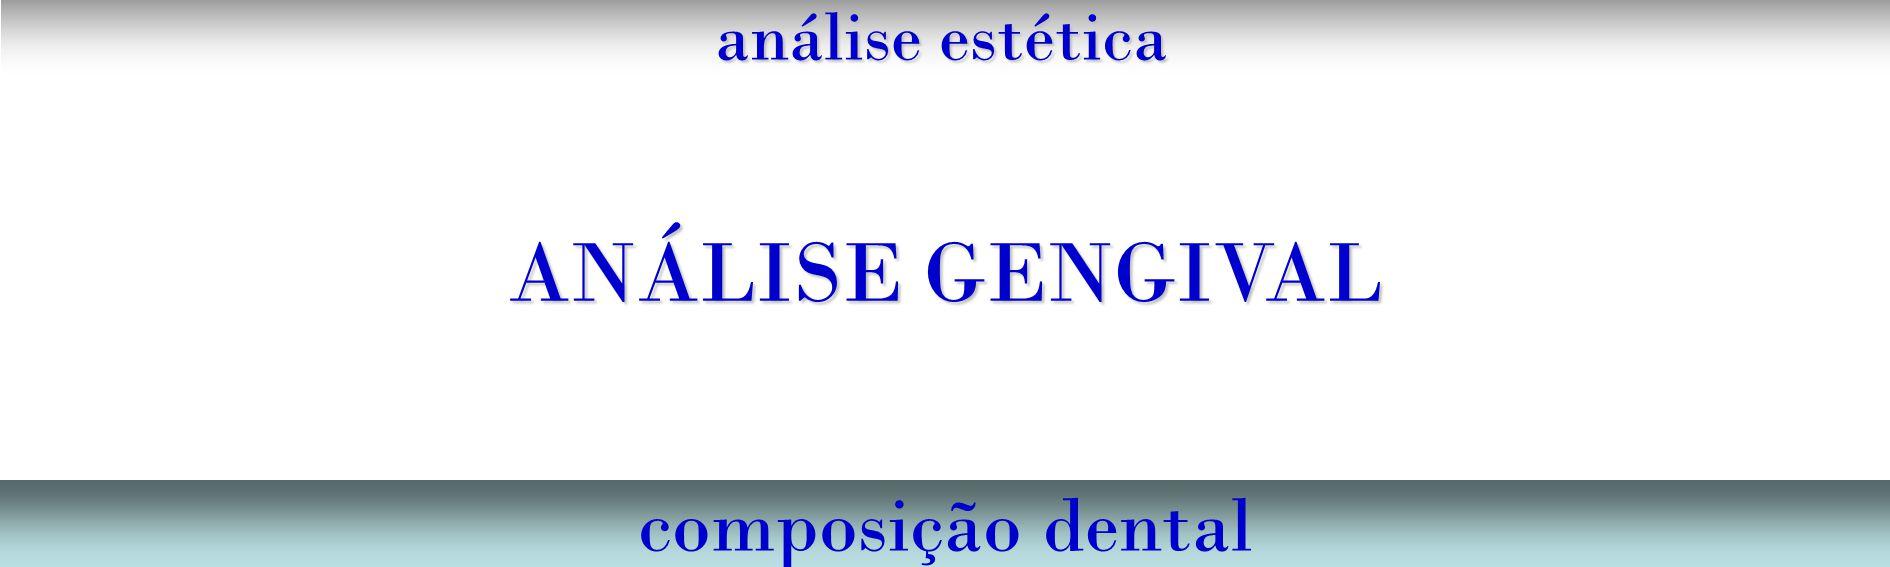 análise estética ANÁLISE GENGIVAL composição dental